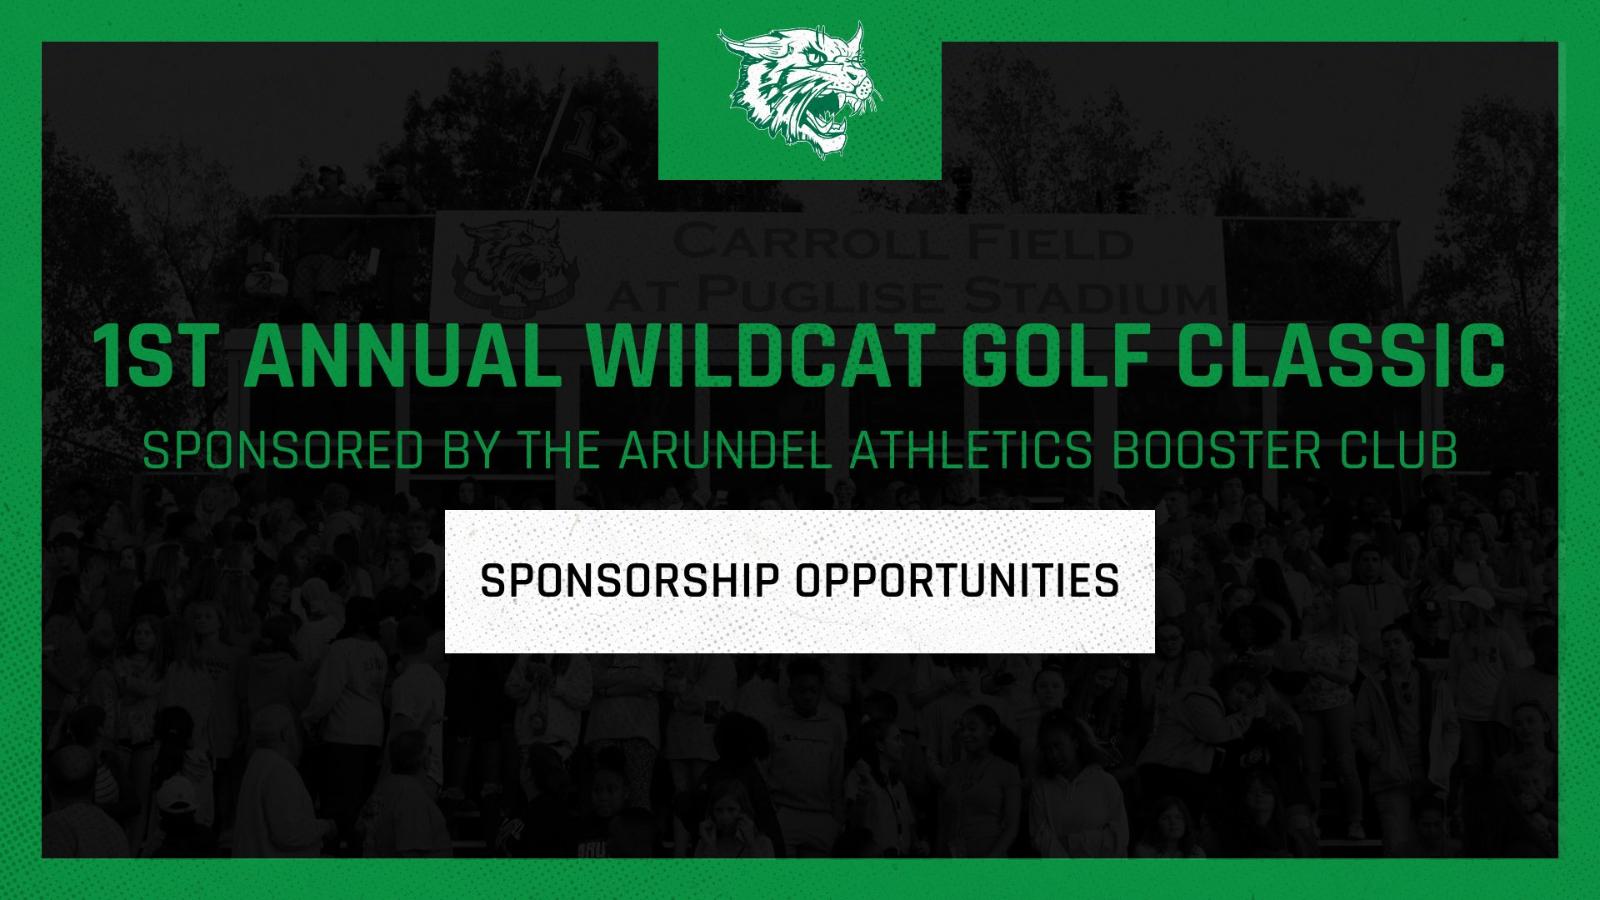 Booster Club Golf Sponsorships